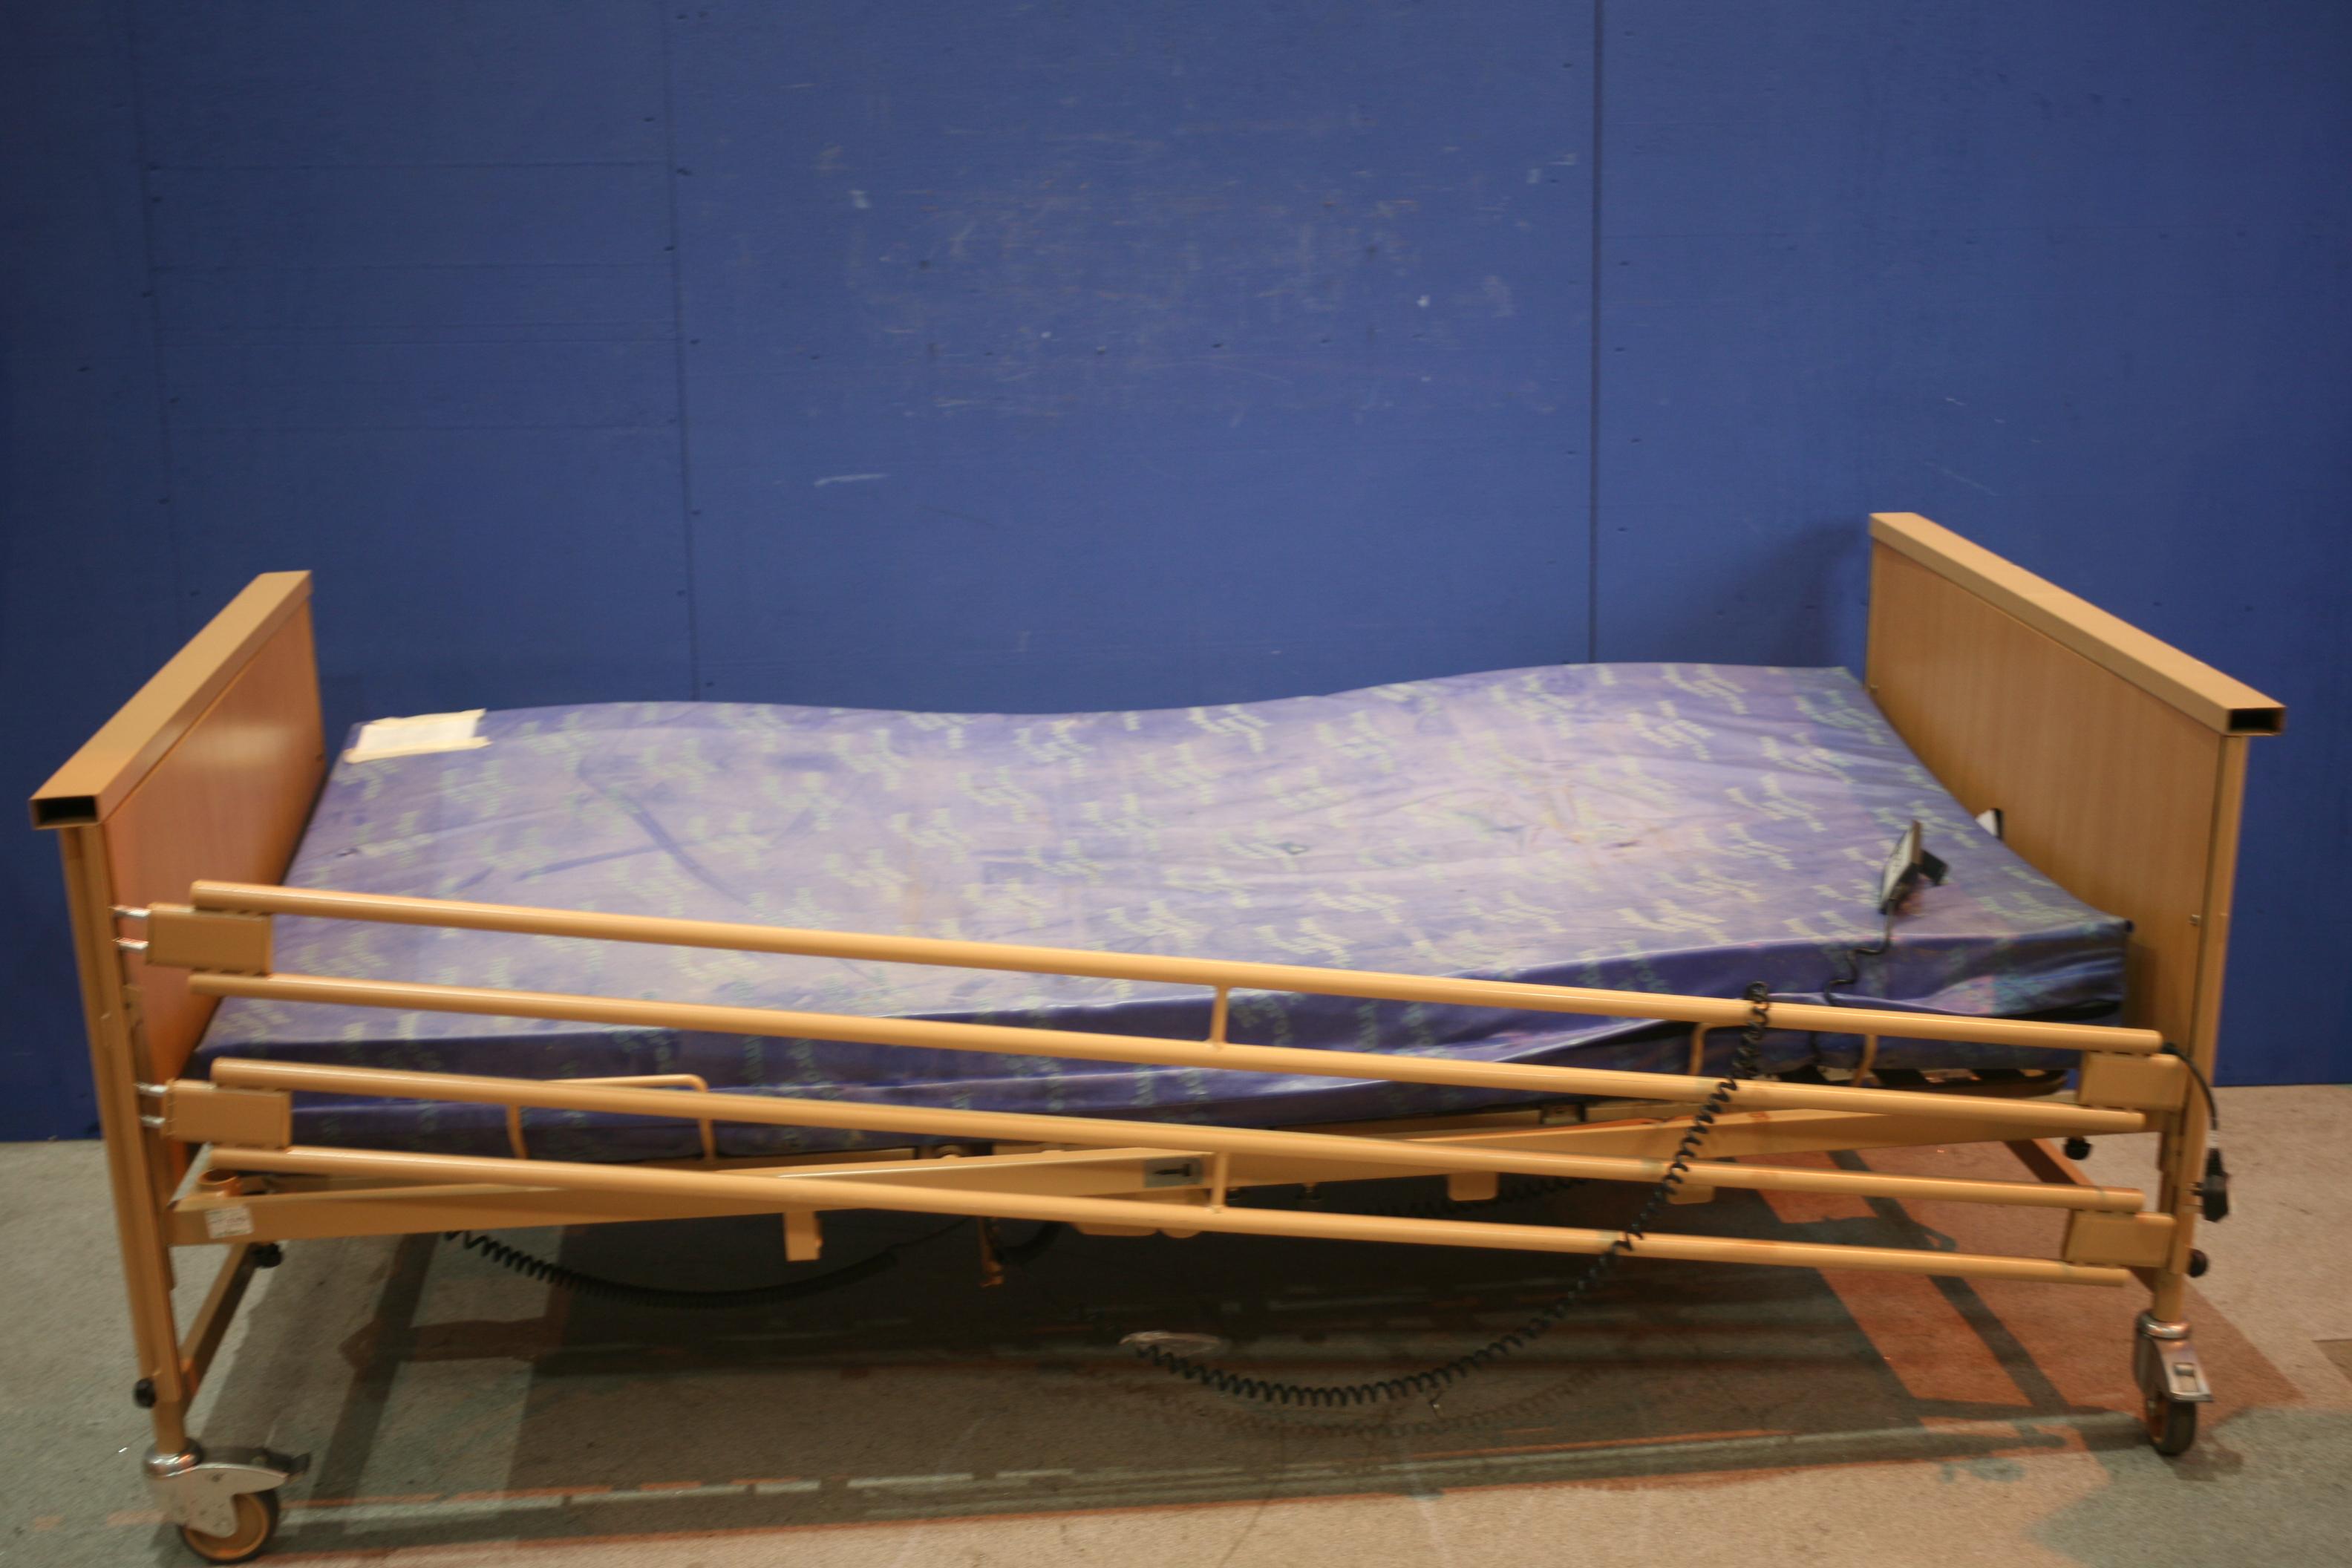 Lot 122 - Electric Hospital Bed *Broken*